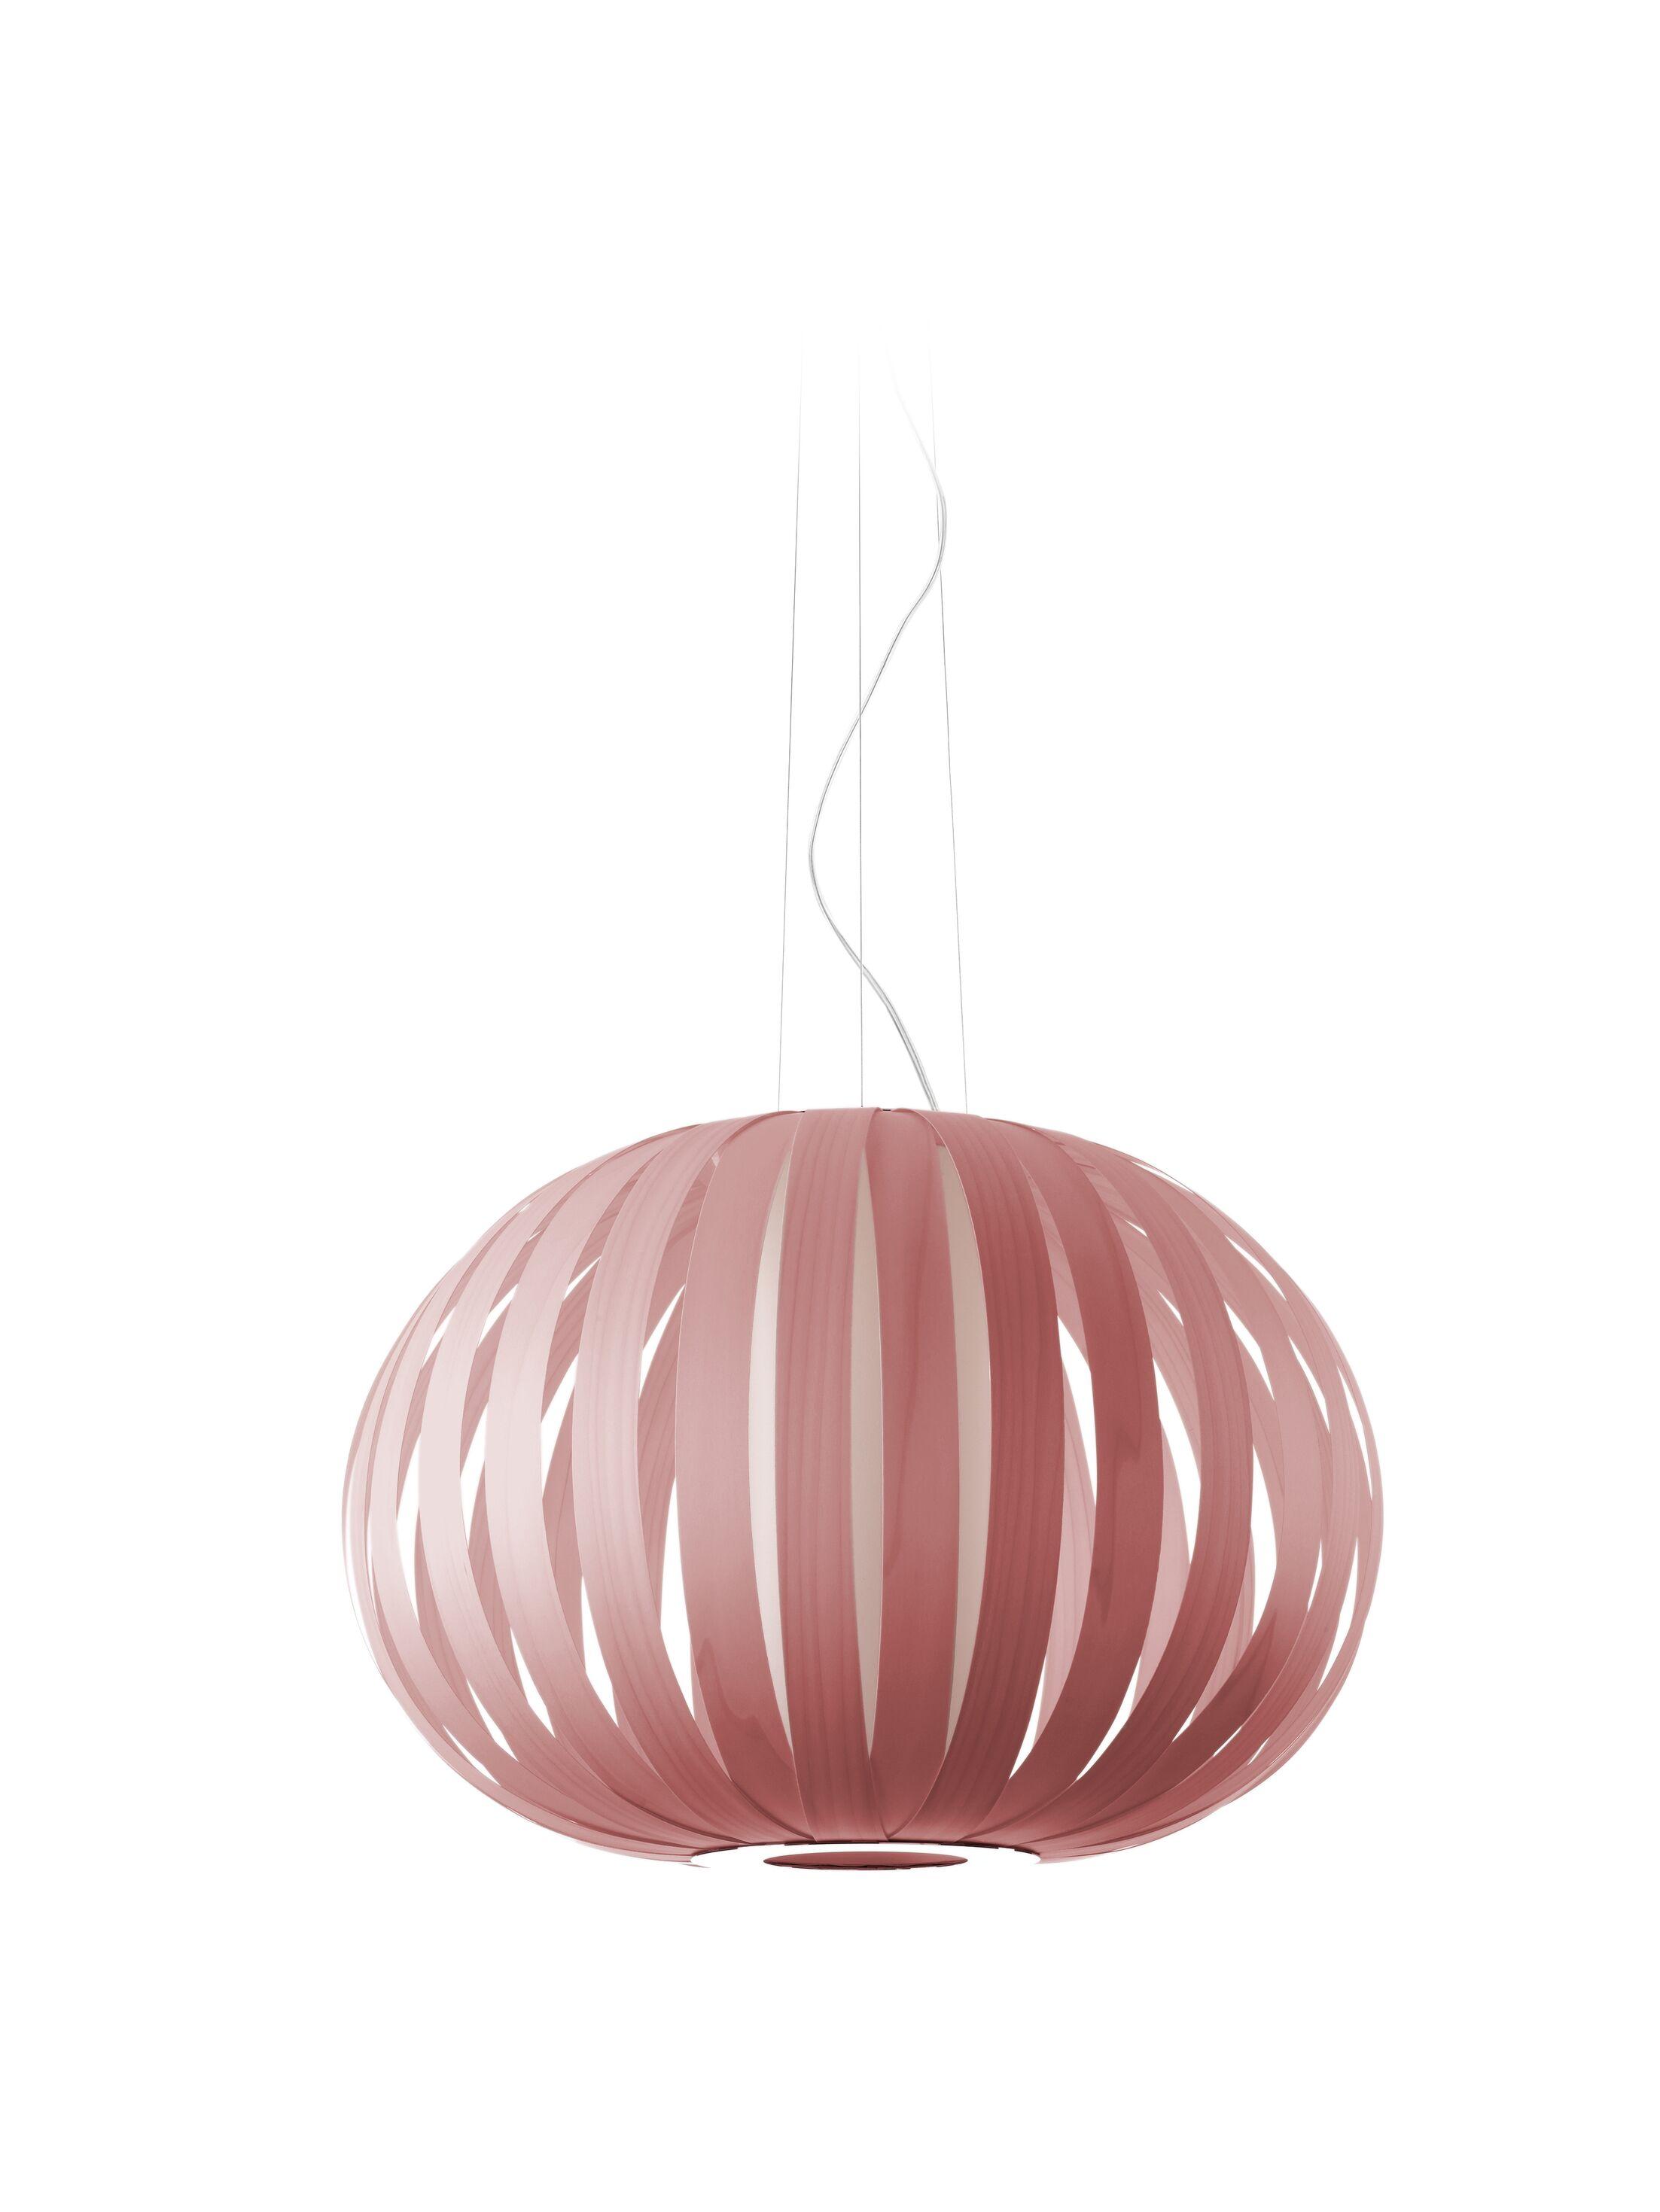 Poppy 1-Light Pendant Bulb Type: GU24, Size: 24.8